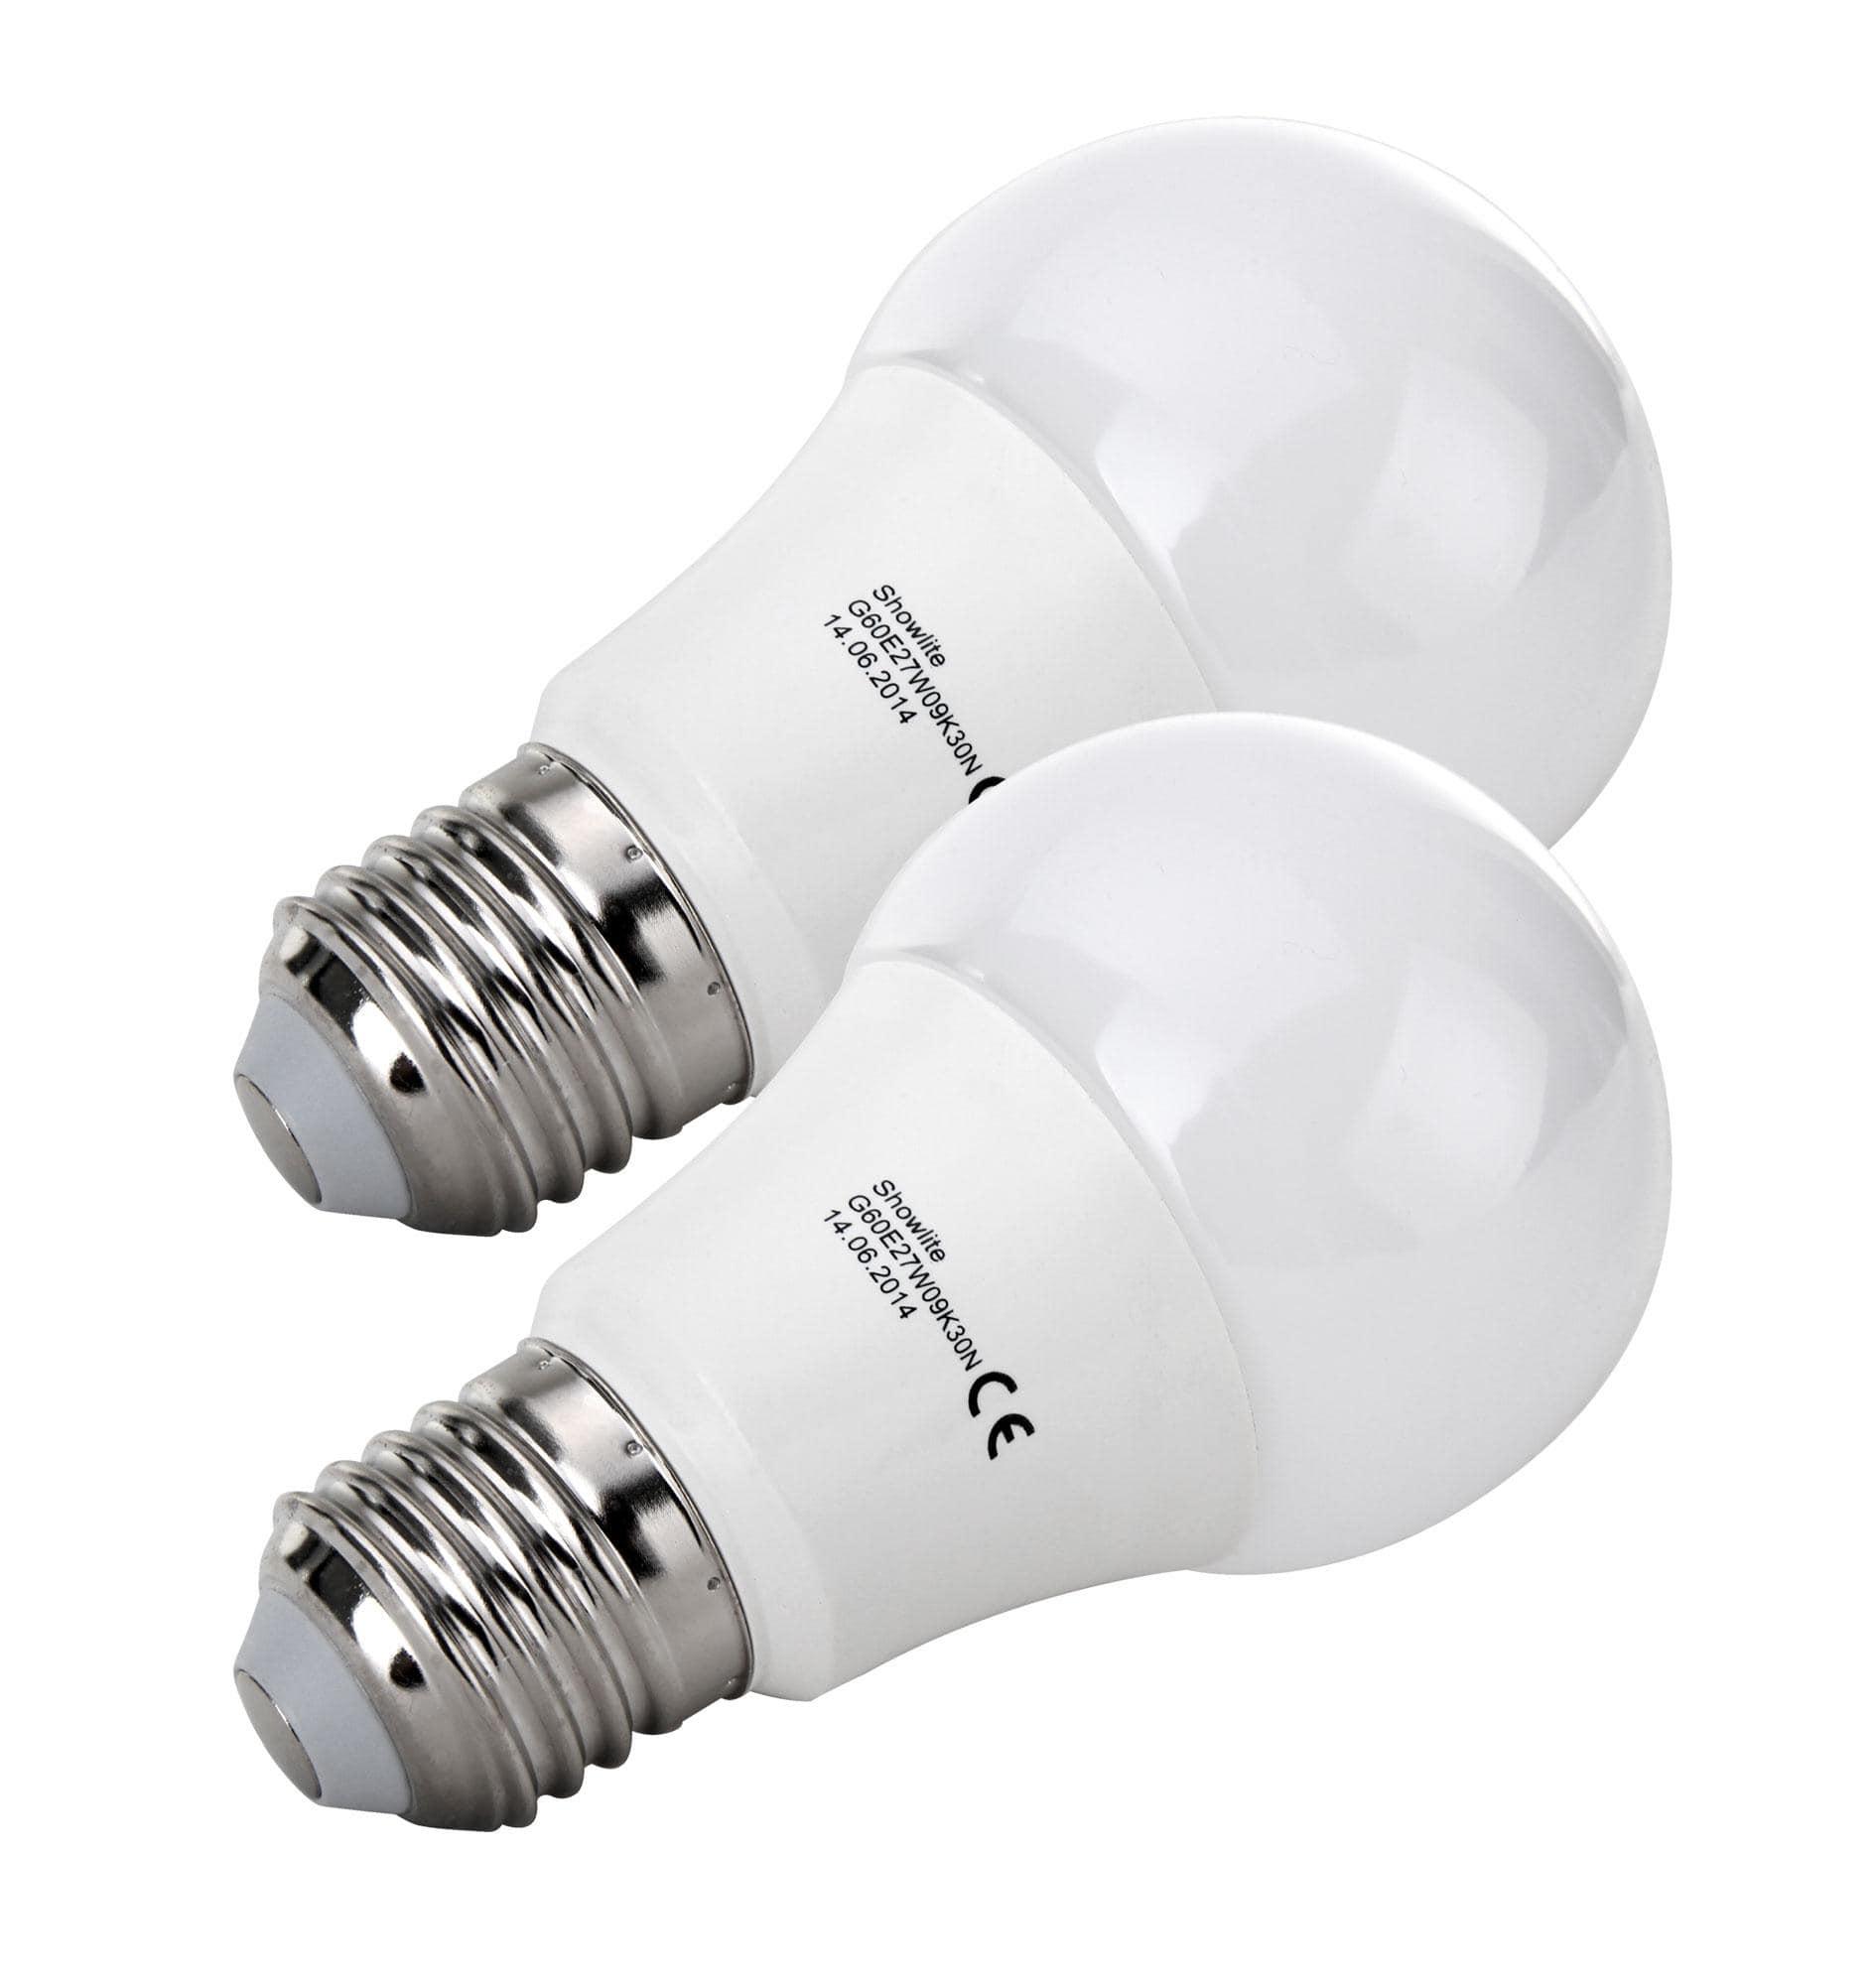 2 Piece Set Show Lite Led Bulb G60e27w09k30n 9 Watts 860 Lumens E27 Socket 3000 Kelvin